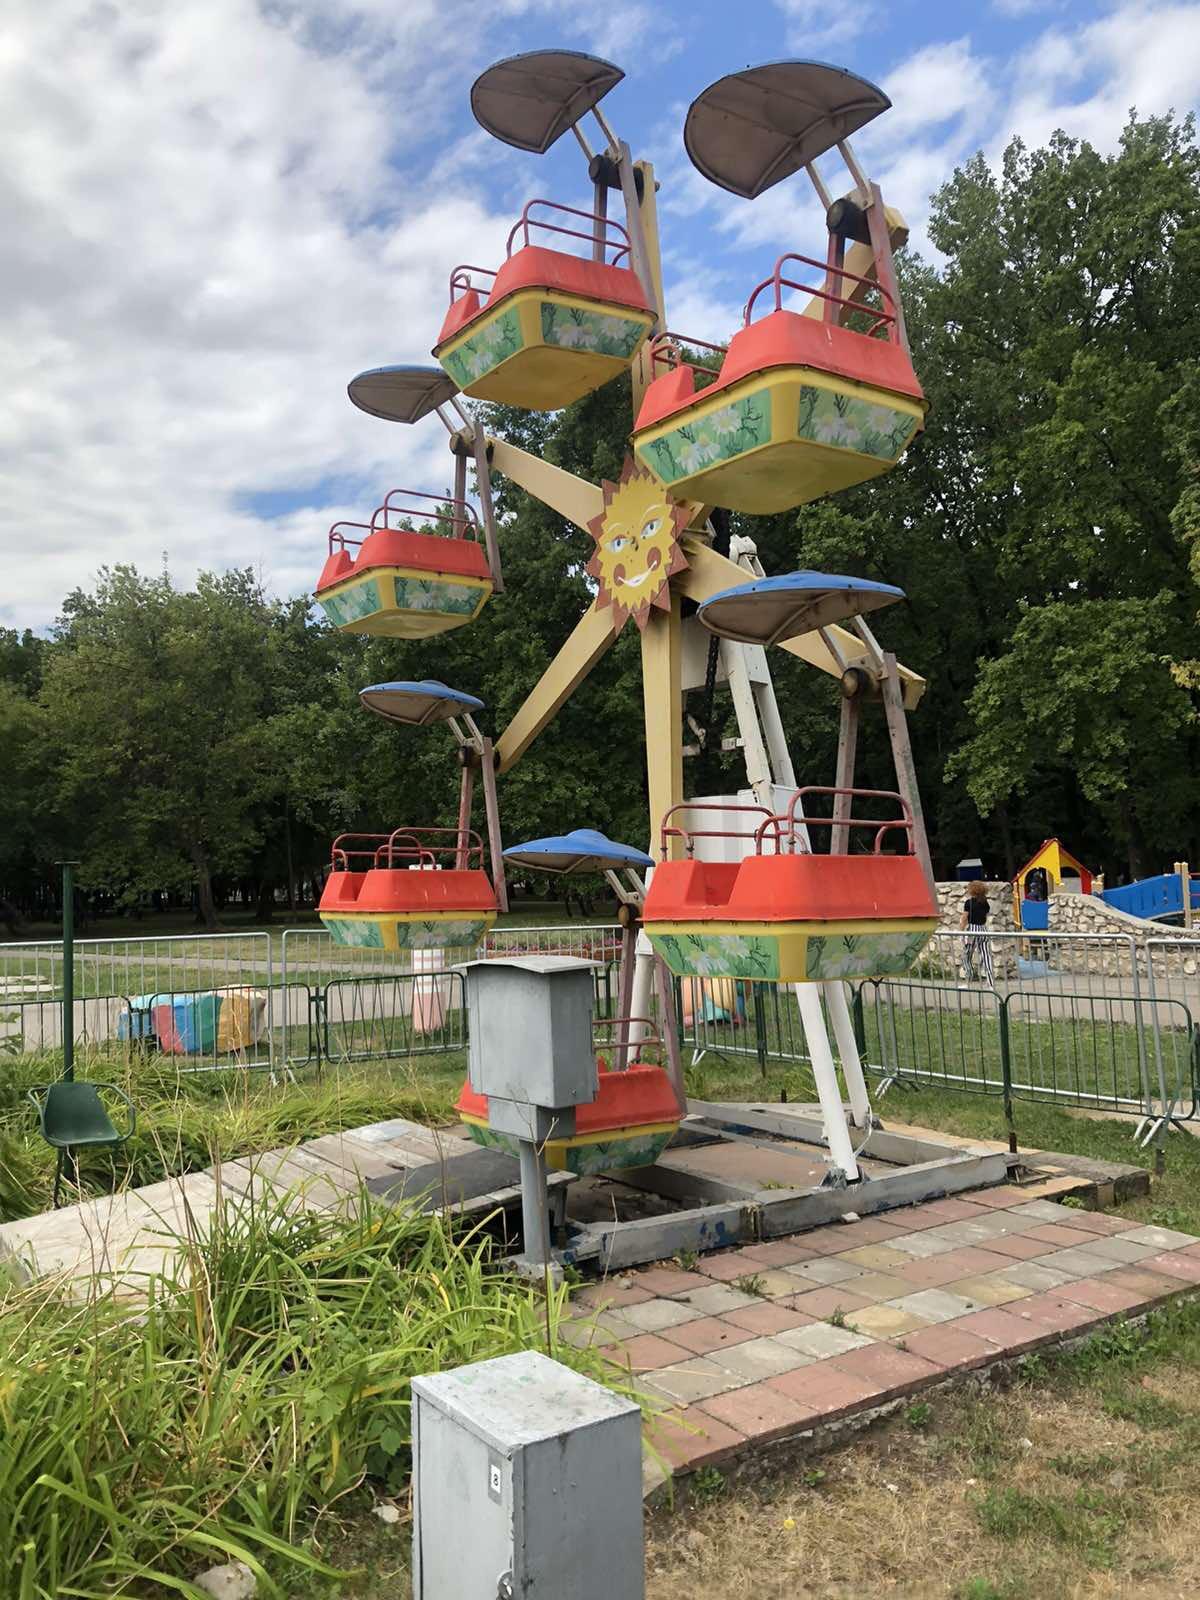 Прокуратура требует снести два аттракциона в парке Гагарина